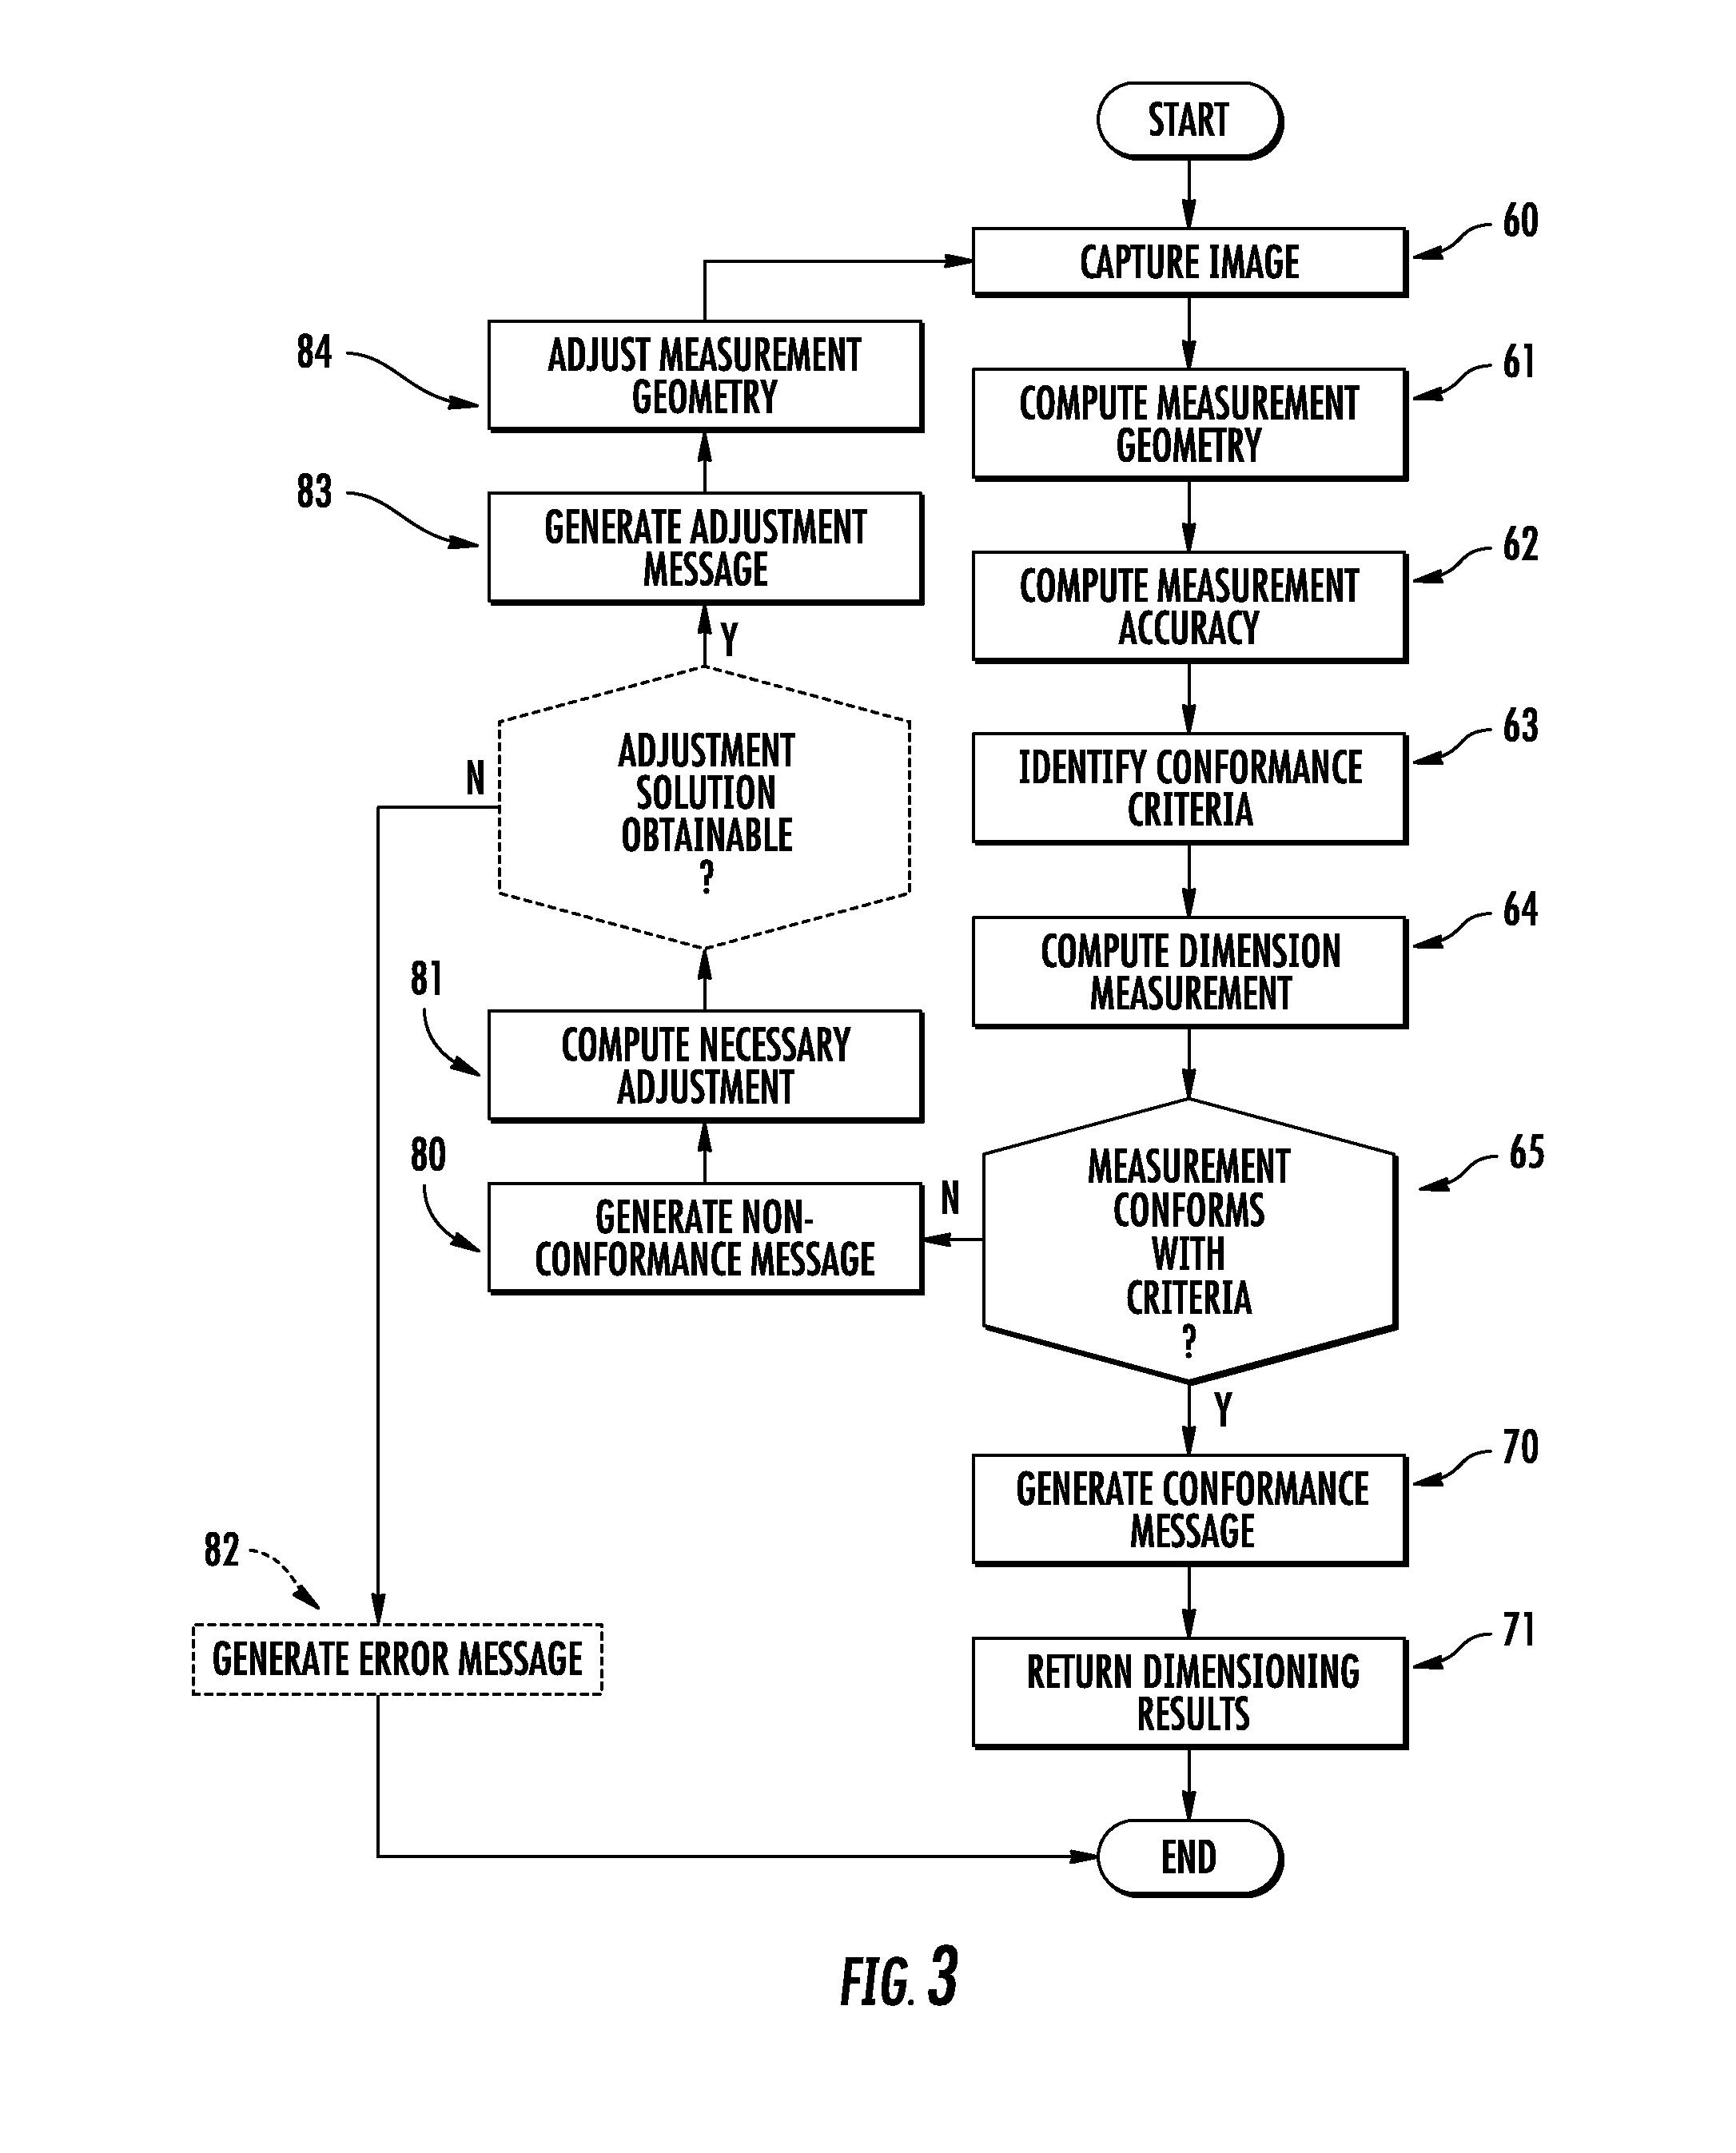 Patent US 9,897,434 B2